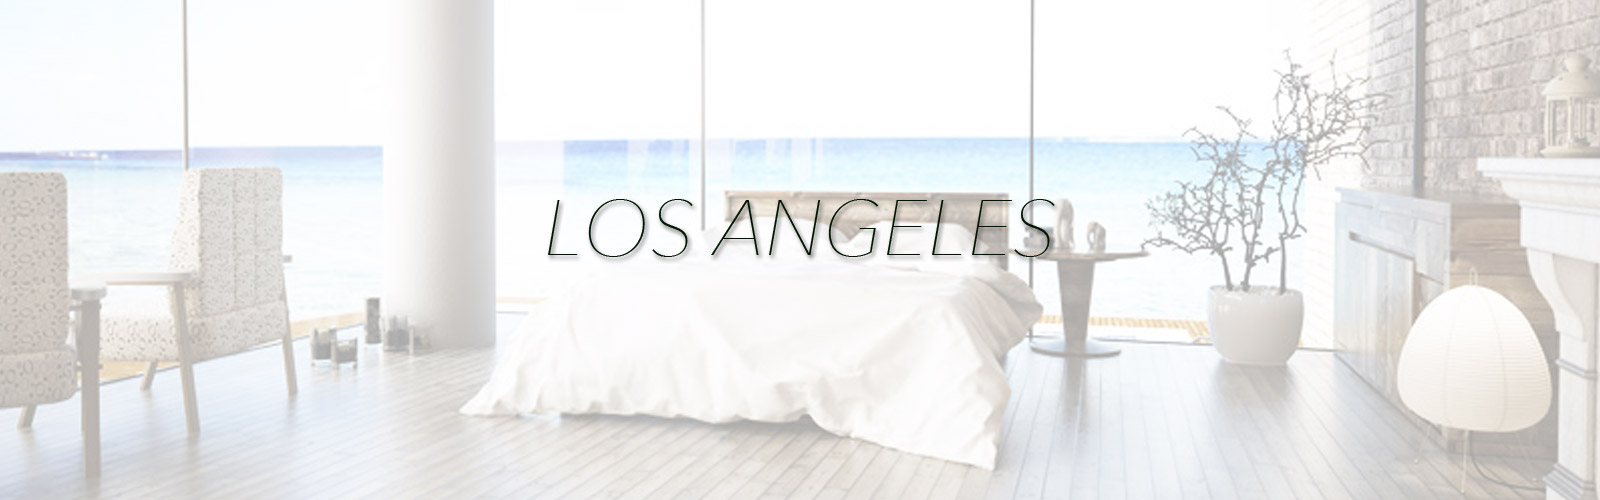 store angeles monte el bed bk and furniture los mattress futons futon